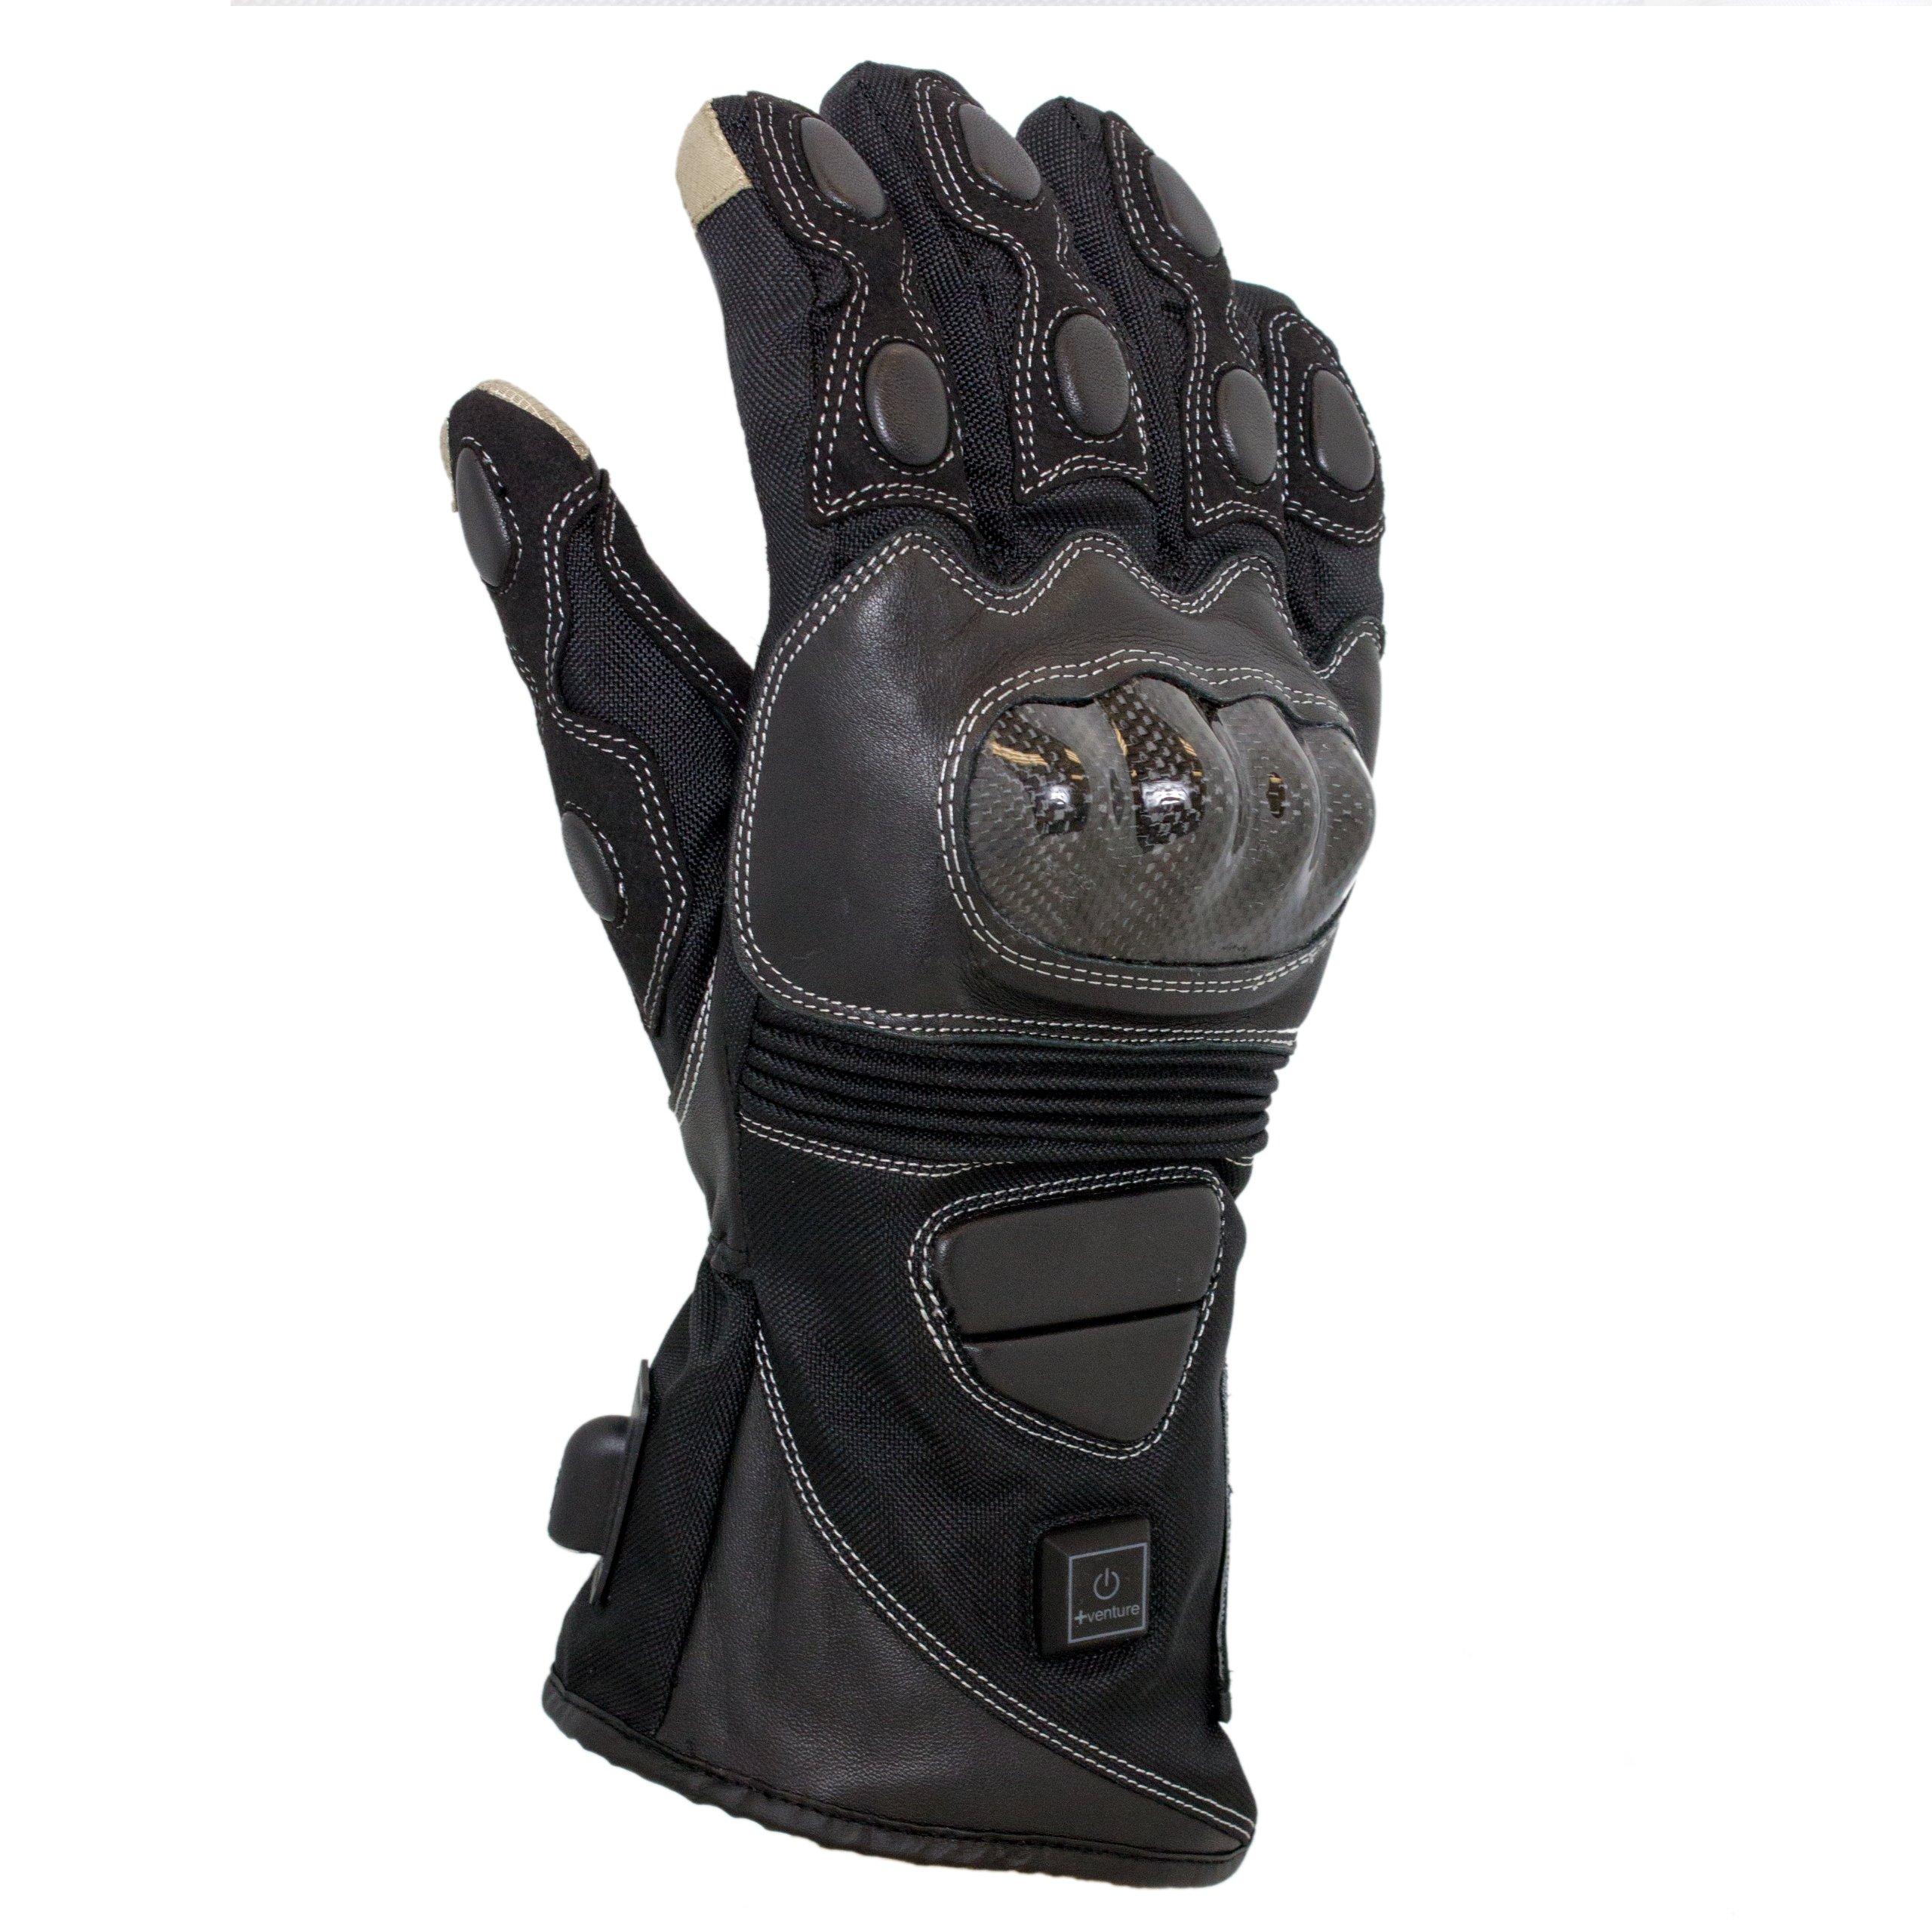 VentureHeat 12V Heated Carbon Fiber Knuckle Motorcycle Gloves (Black, Medium)